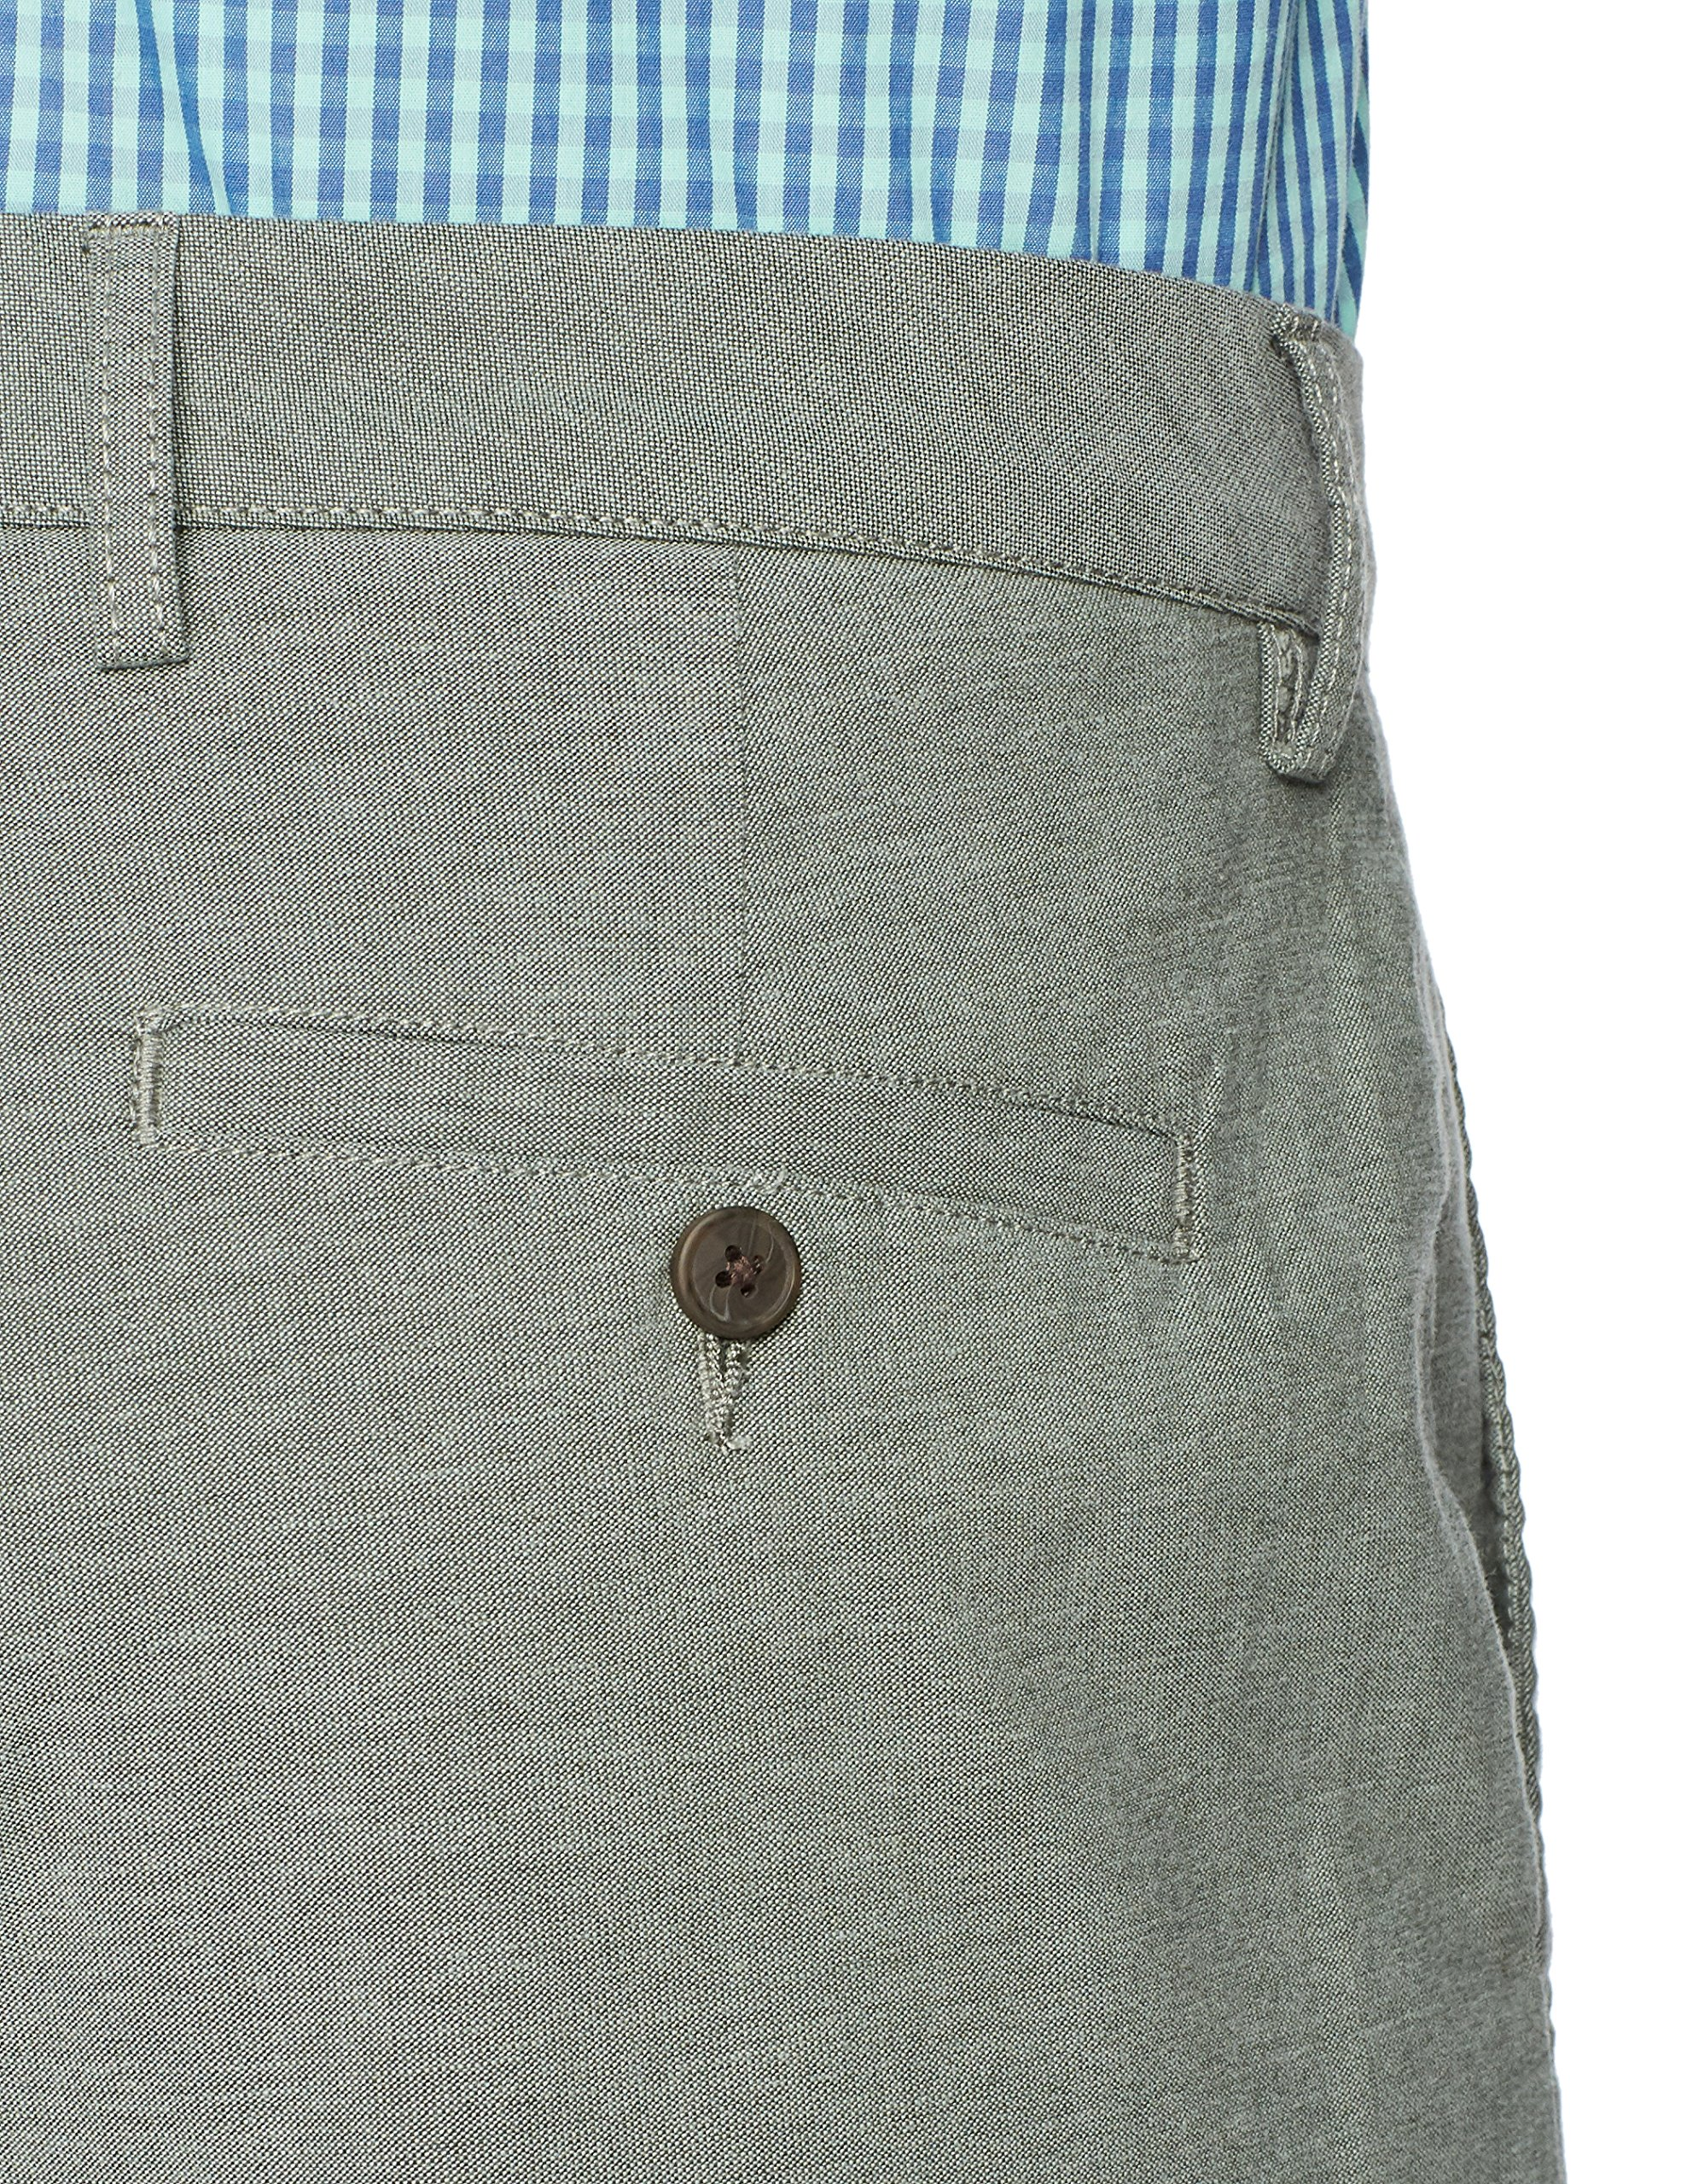 Goodthreads Men's 9'' Inseam Lightweight Oxford Short, Olive, 32 by Goodthreads (Image #5)